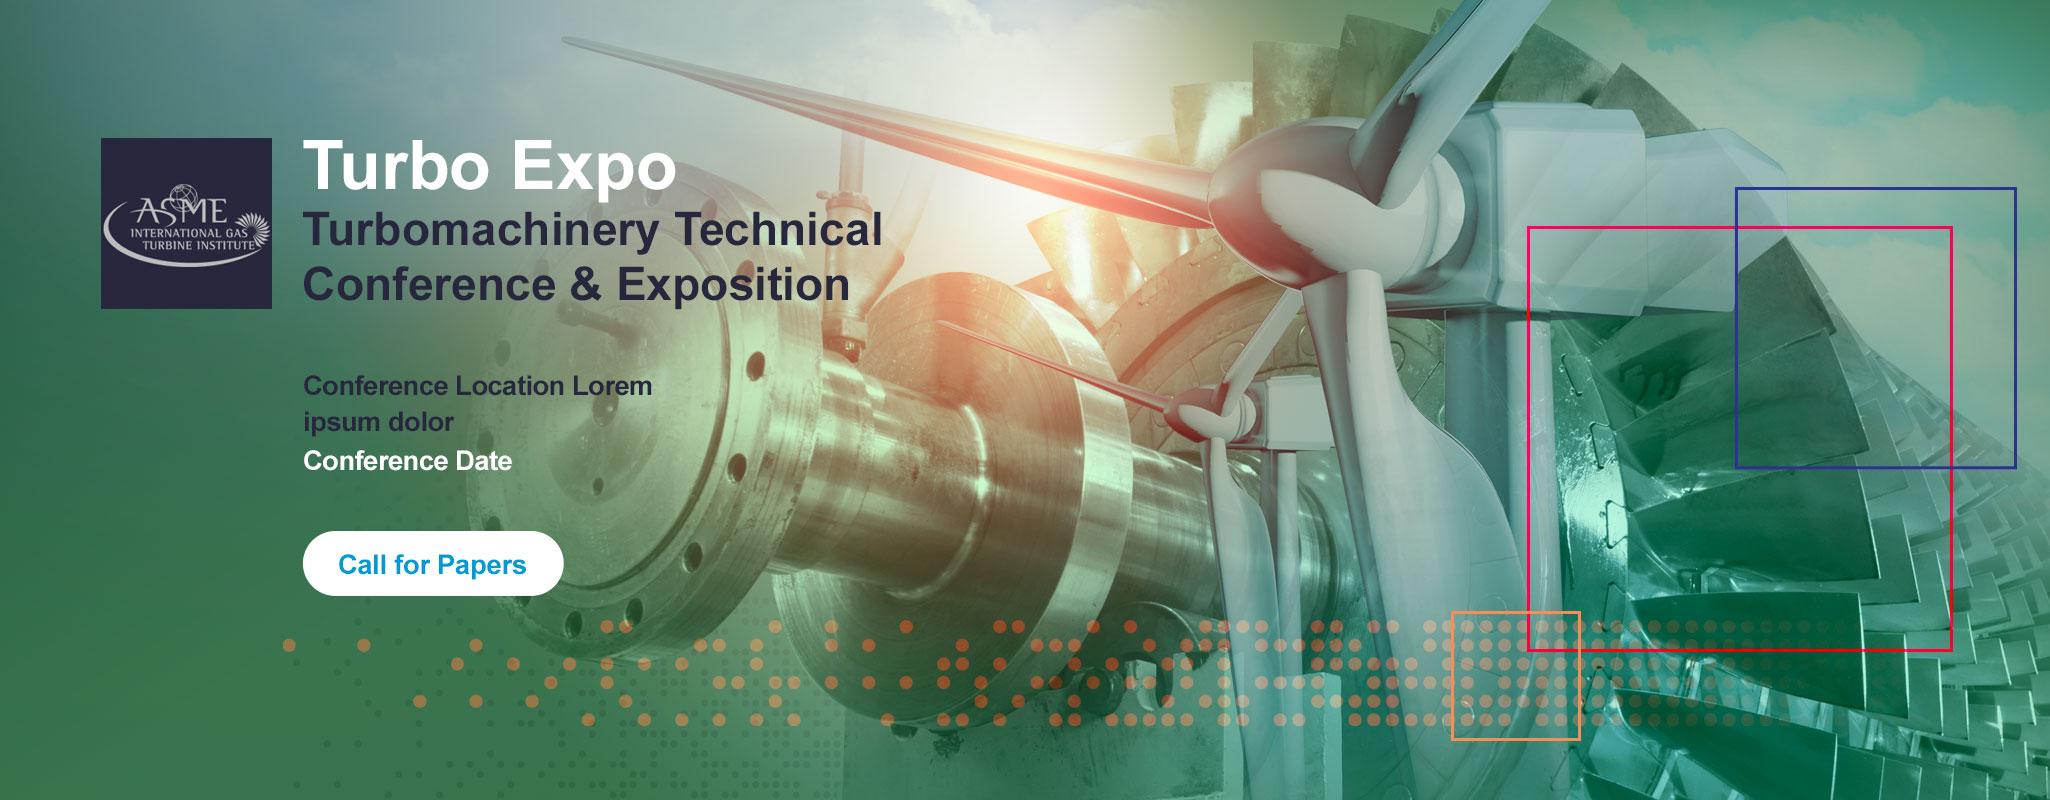 TurboExpo 2020 Conference landing page hero